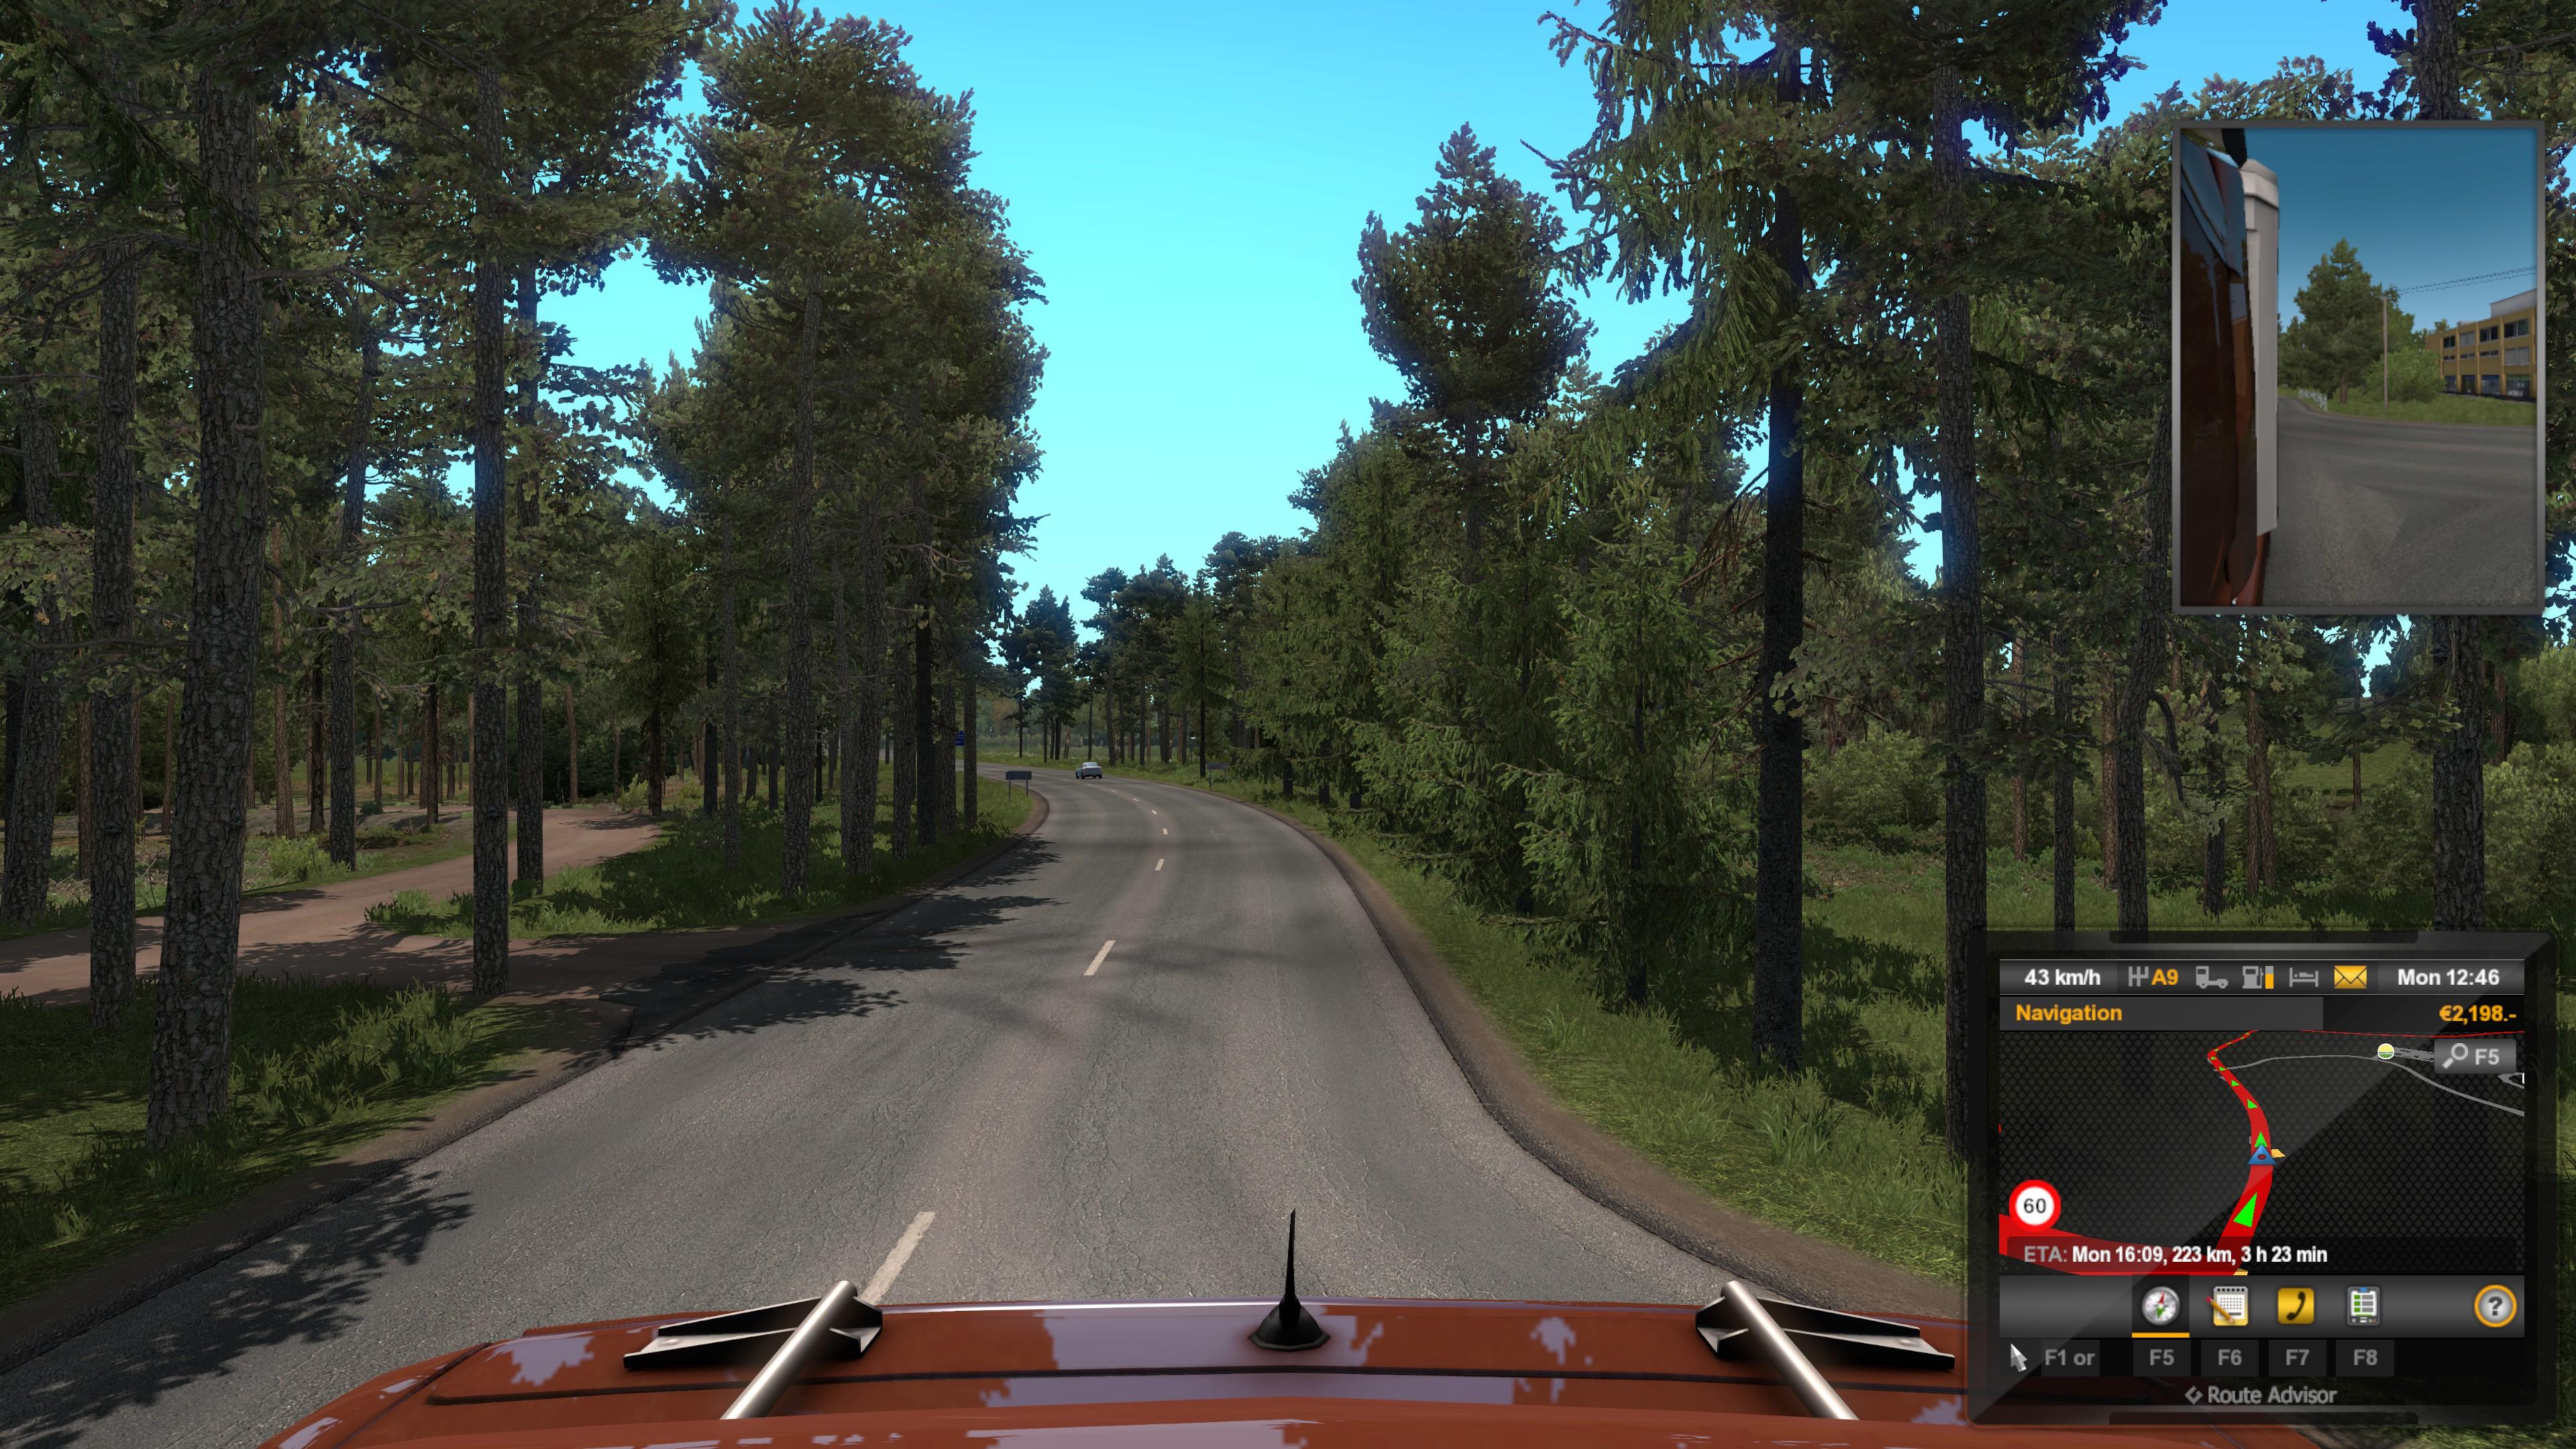 Euro Truck Simulator 2 goes to Russia | Rock Paper Shotgun